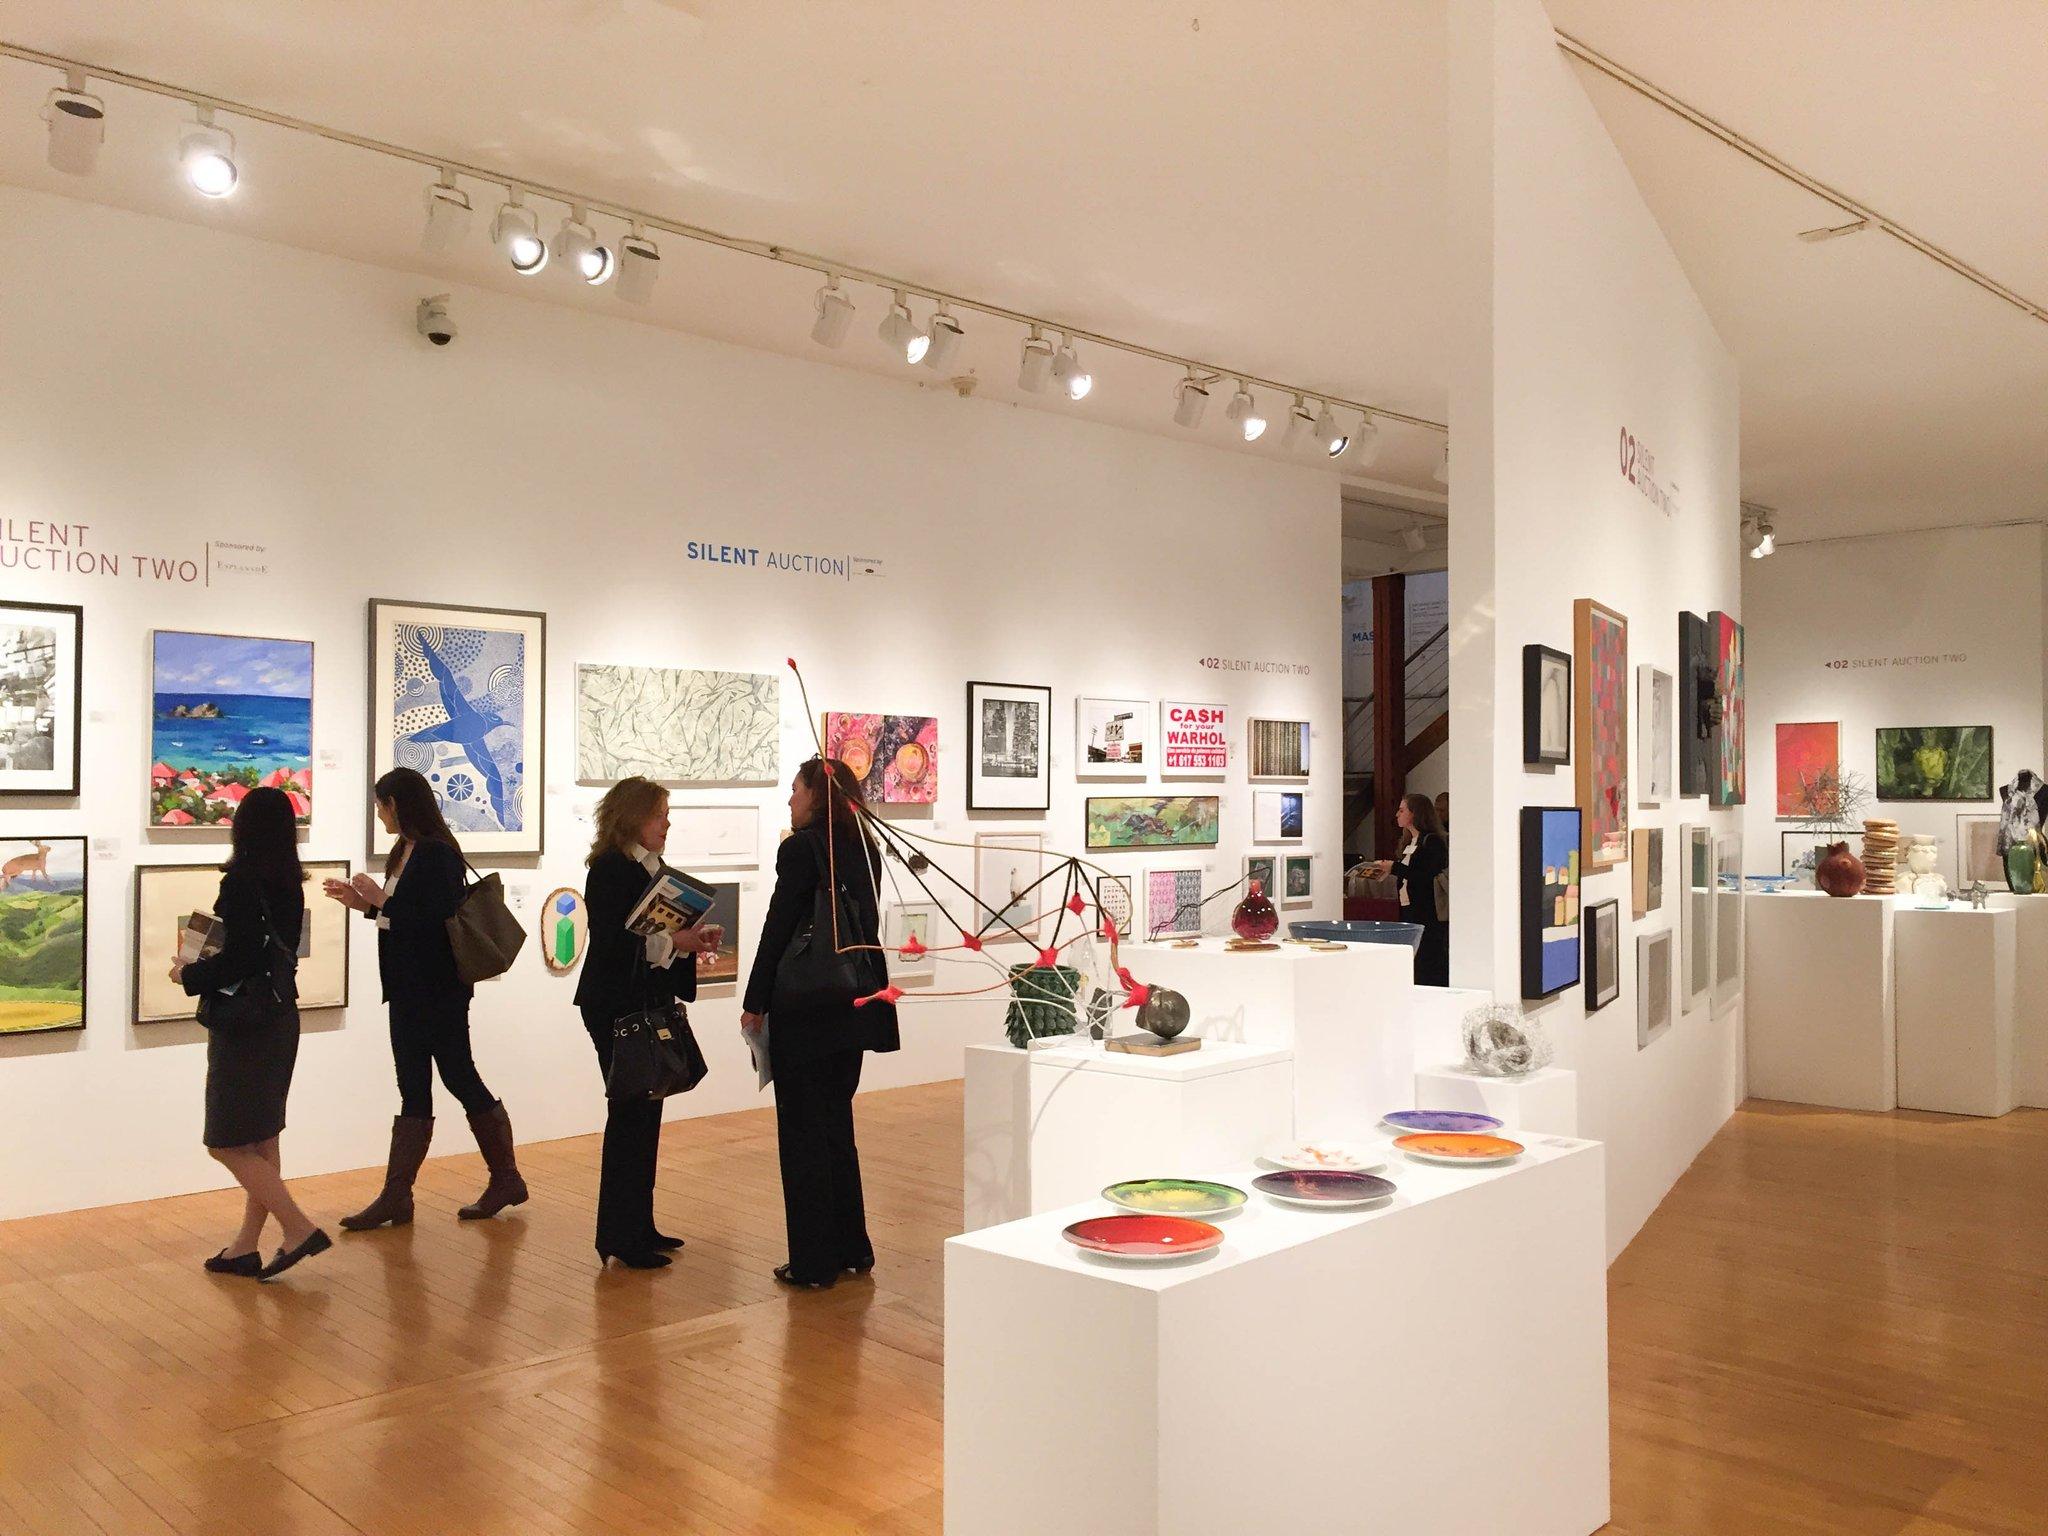 For your Thursday afternoon commute home: 5 Upcoming Art Events in Boston https://t.co/KwjkLlDkuw @ICAinBOSTON @MANMWA2 @MassArt #bosarts https://t.co/P75WEyUnap